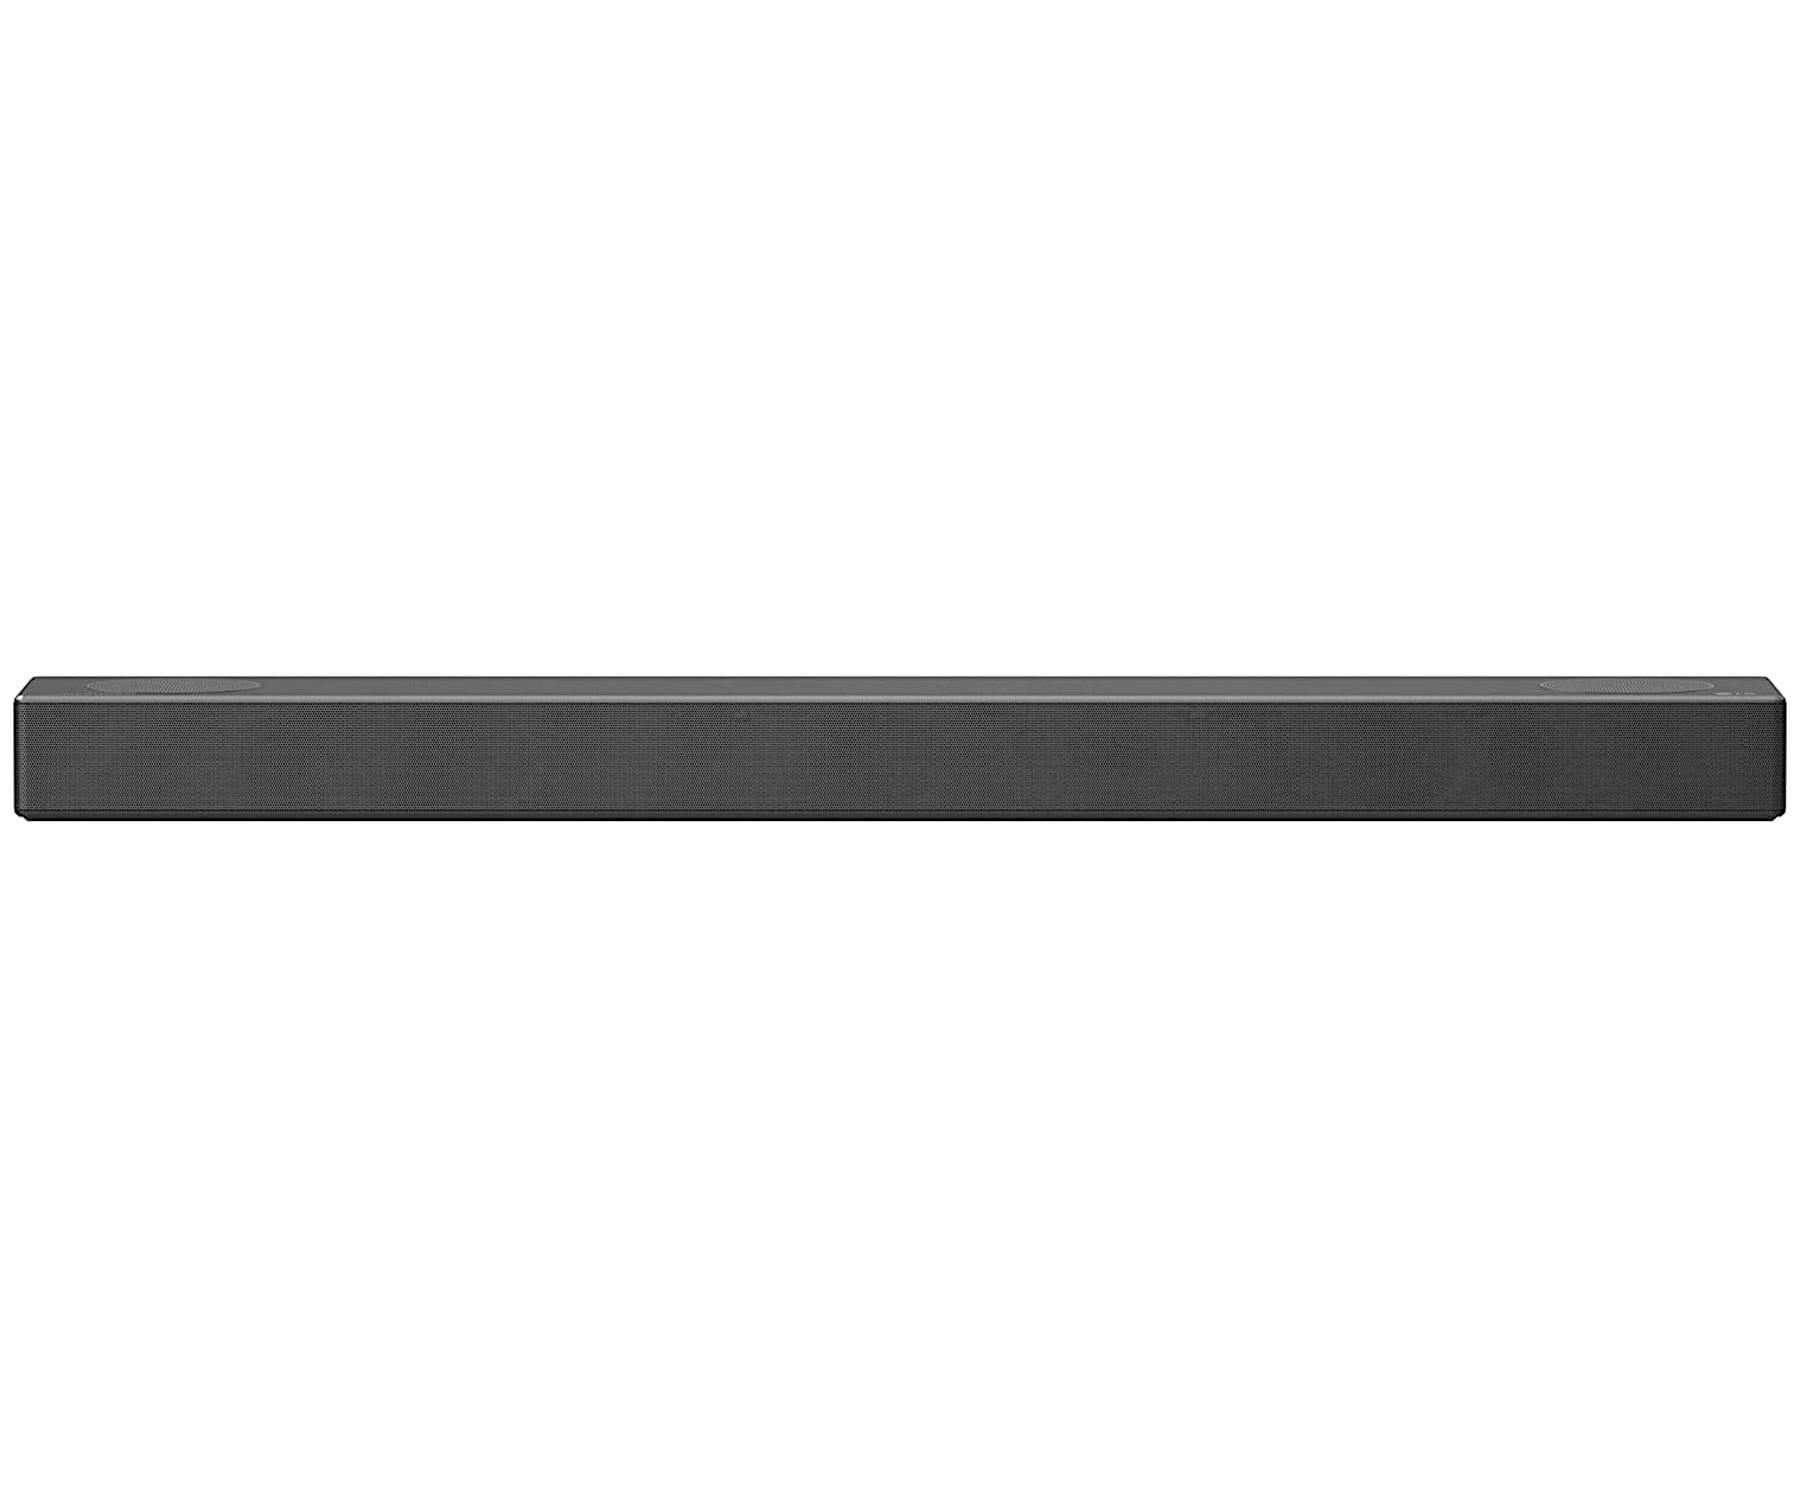 LG SN7CY BARRA DE SONIDO 160W 3.0.2 MERIDIAN DOLBY ATMOS DTS:X HI-RES BLUETOOTH HDMI